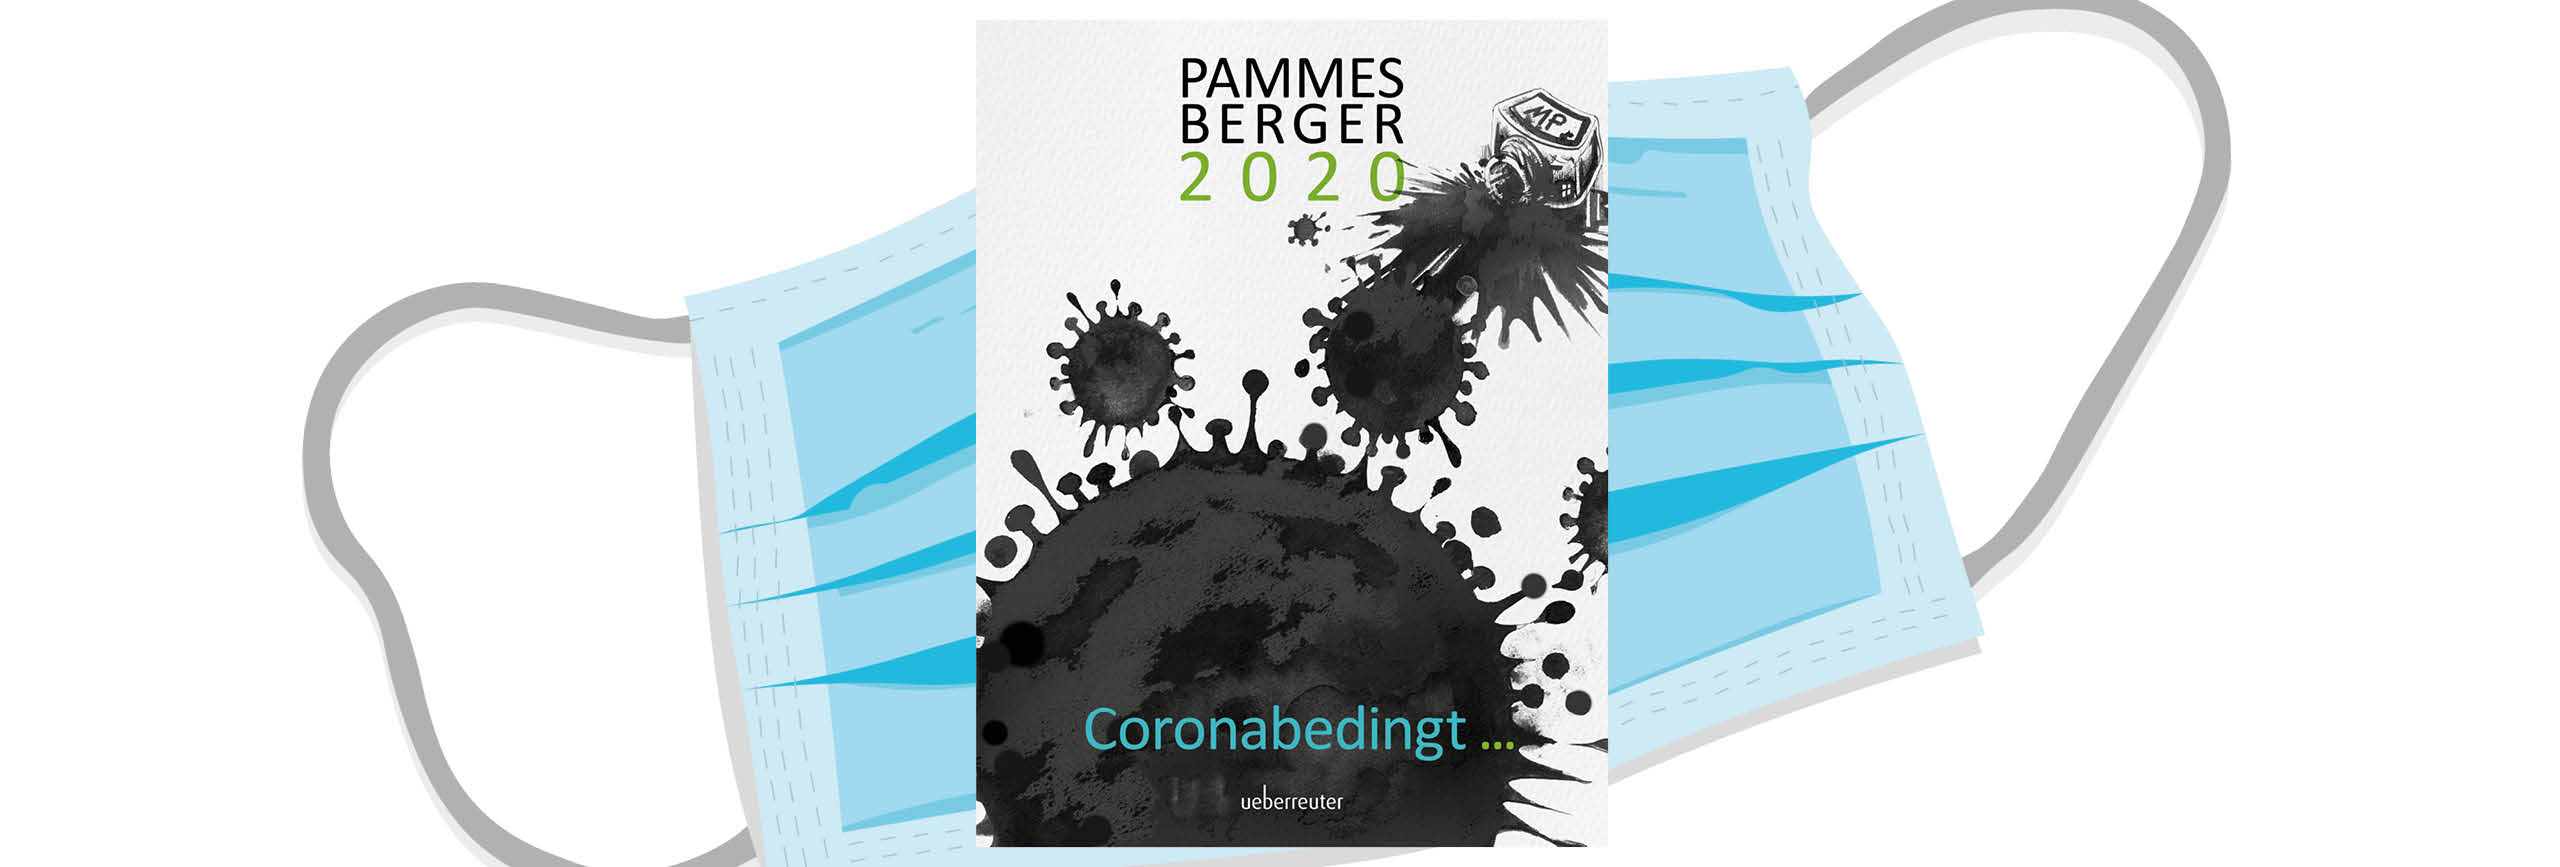 Pammesberger 2020. Coronabedingt...